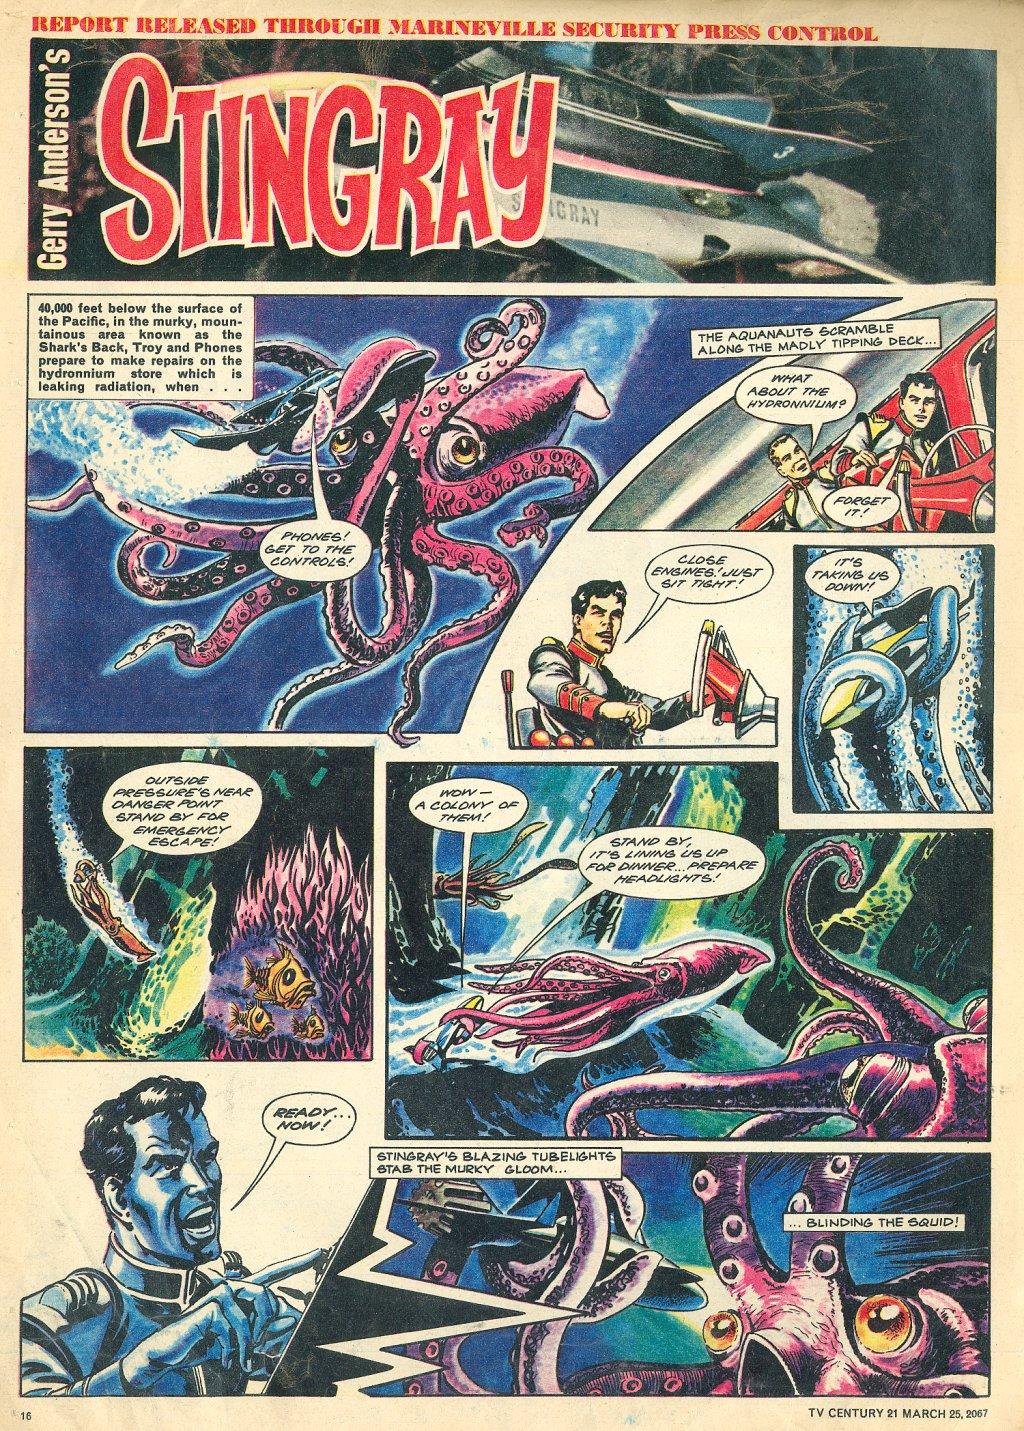 Read online TV Century 21 (TV 21) comic -  Issue #114 - 15